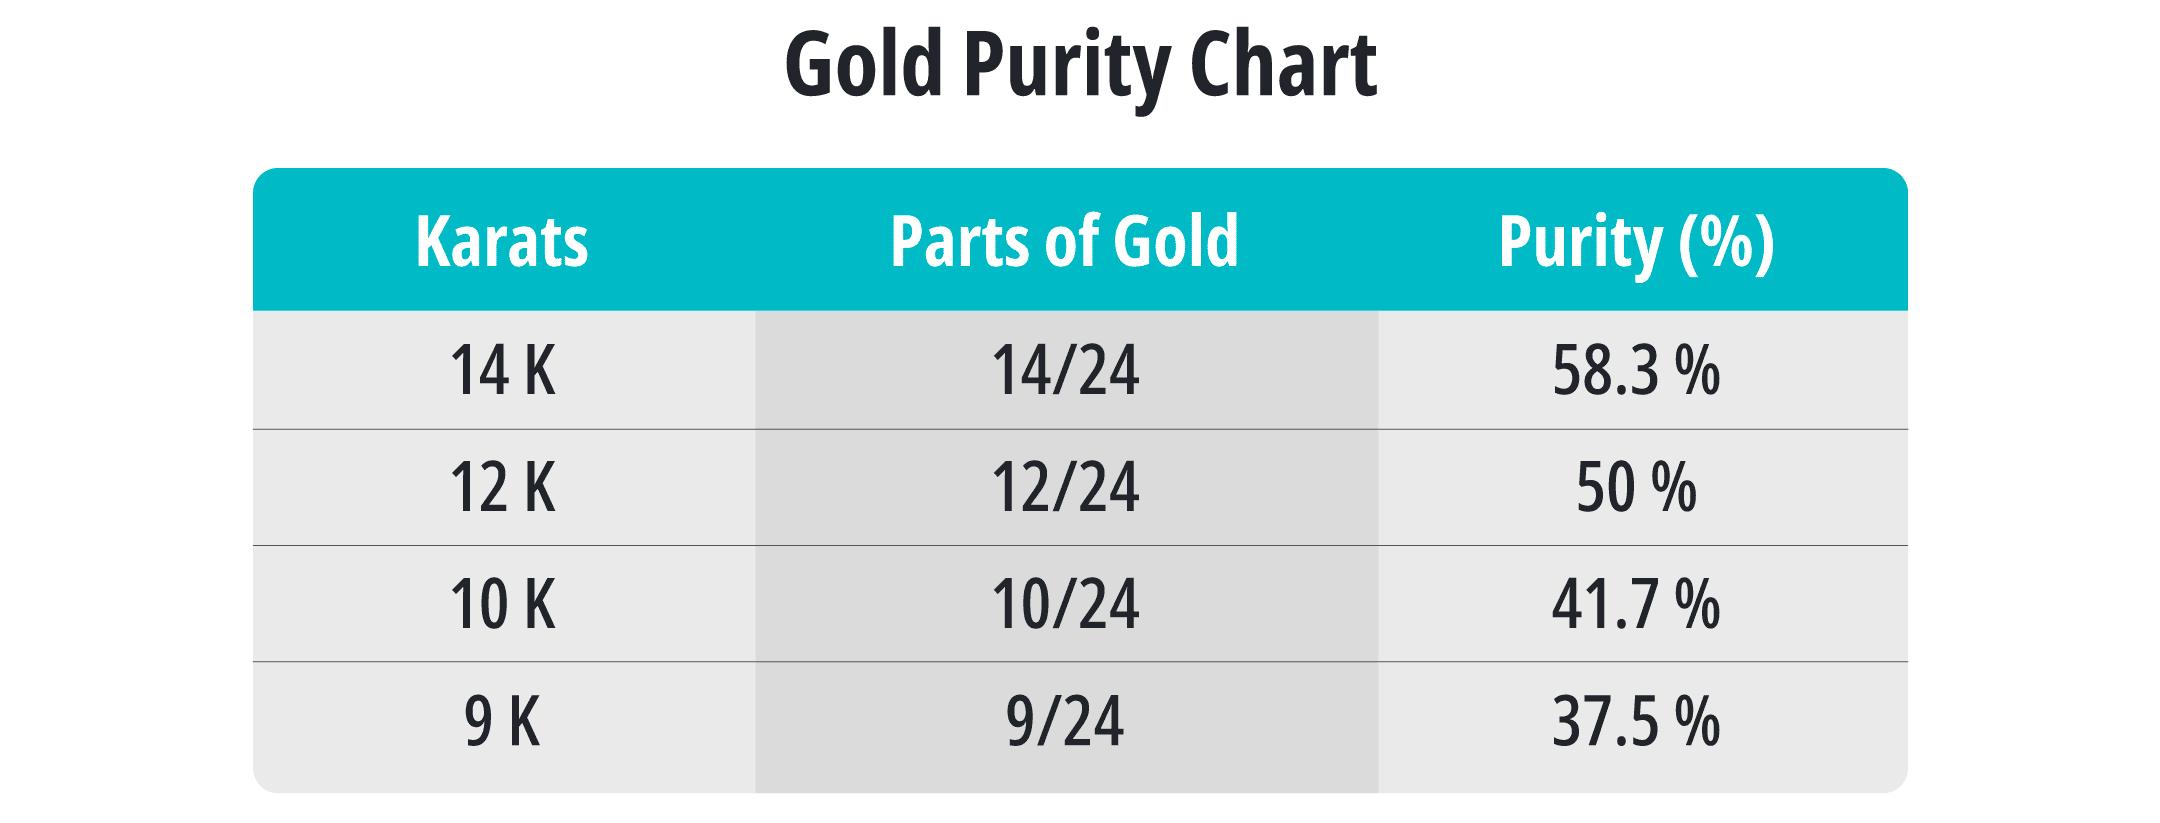 gold karat purity chart